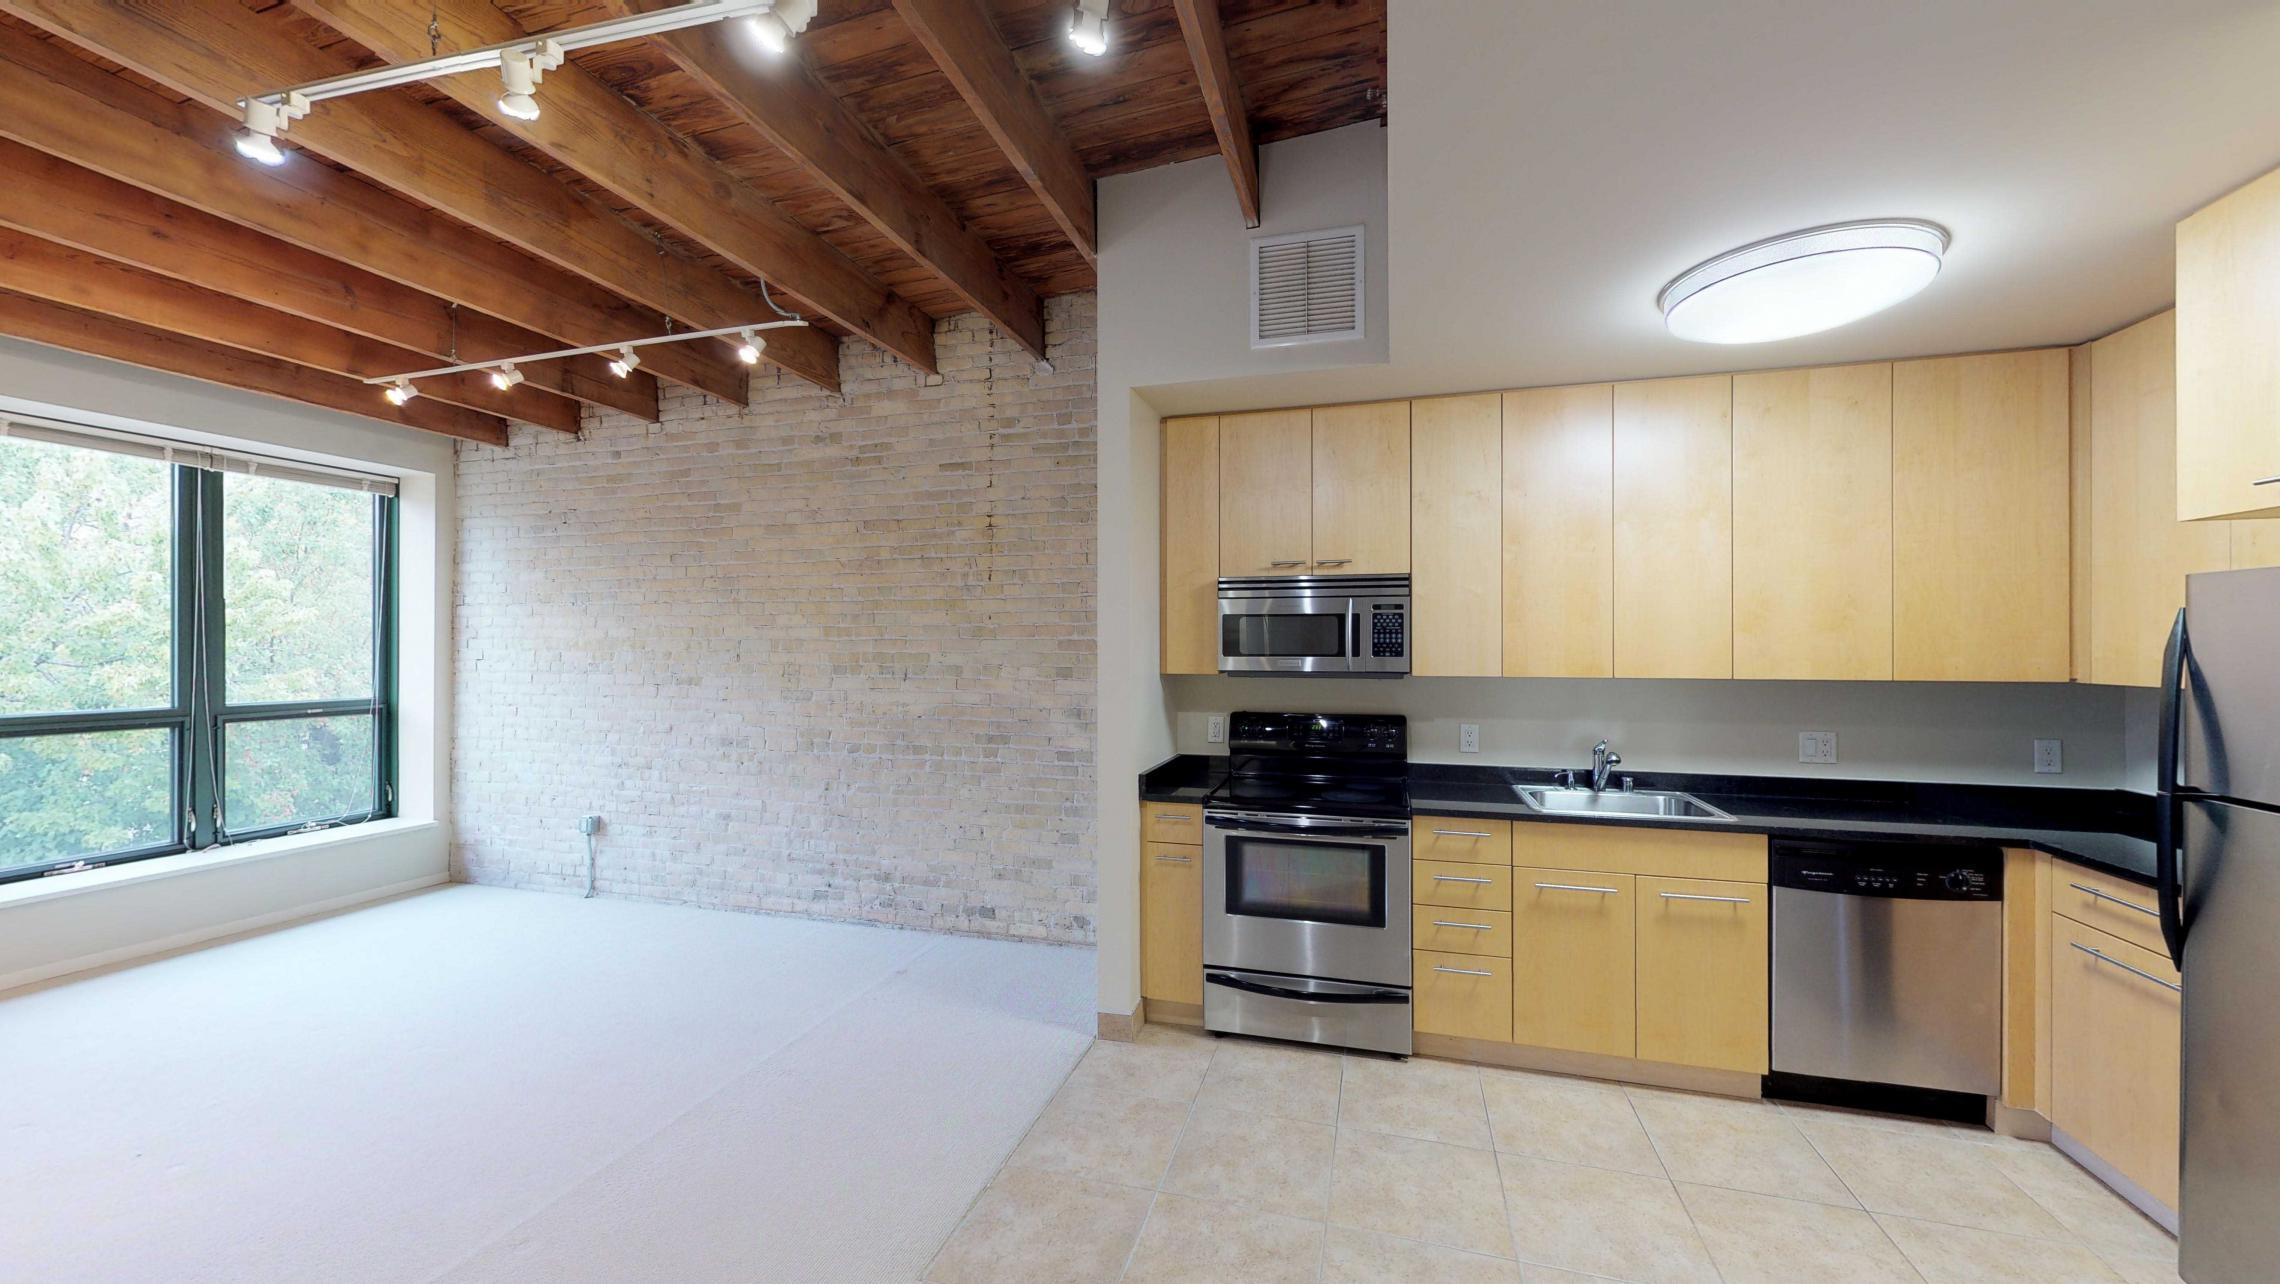 Tobacco-Lofts-Apartment-W220-Studio-Historic-Downtown-Tobacco-Lofts-Apartment-W220-Studio-Historic-Downtown-Madison-Yards-Kitchen-Exposures-BrickMadison-Yards-Kicthen-Exposures-Brick.jpg